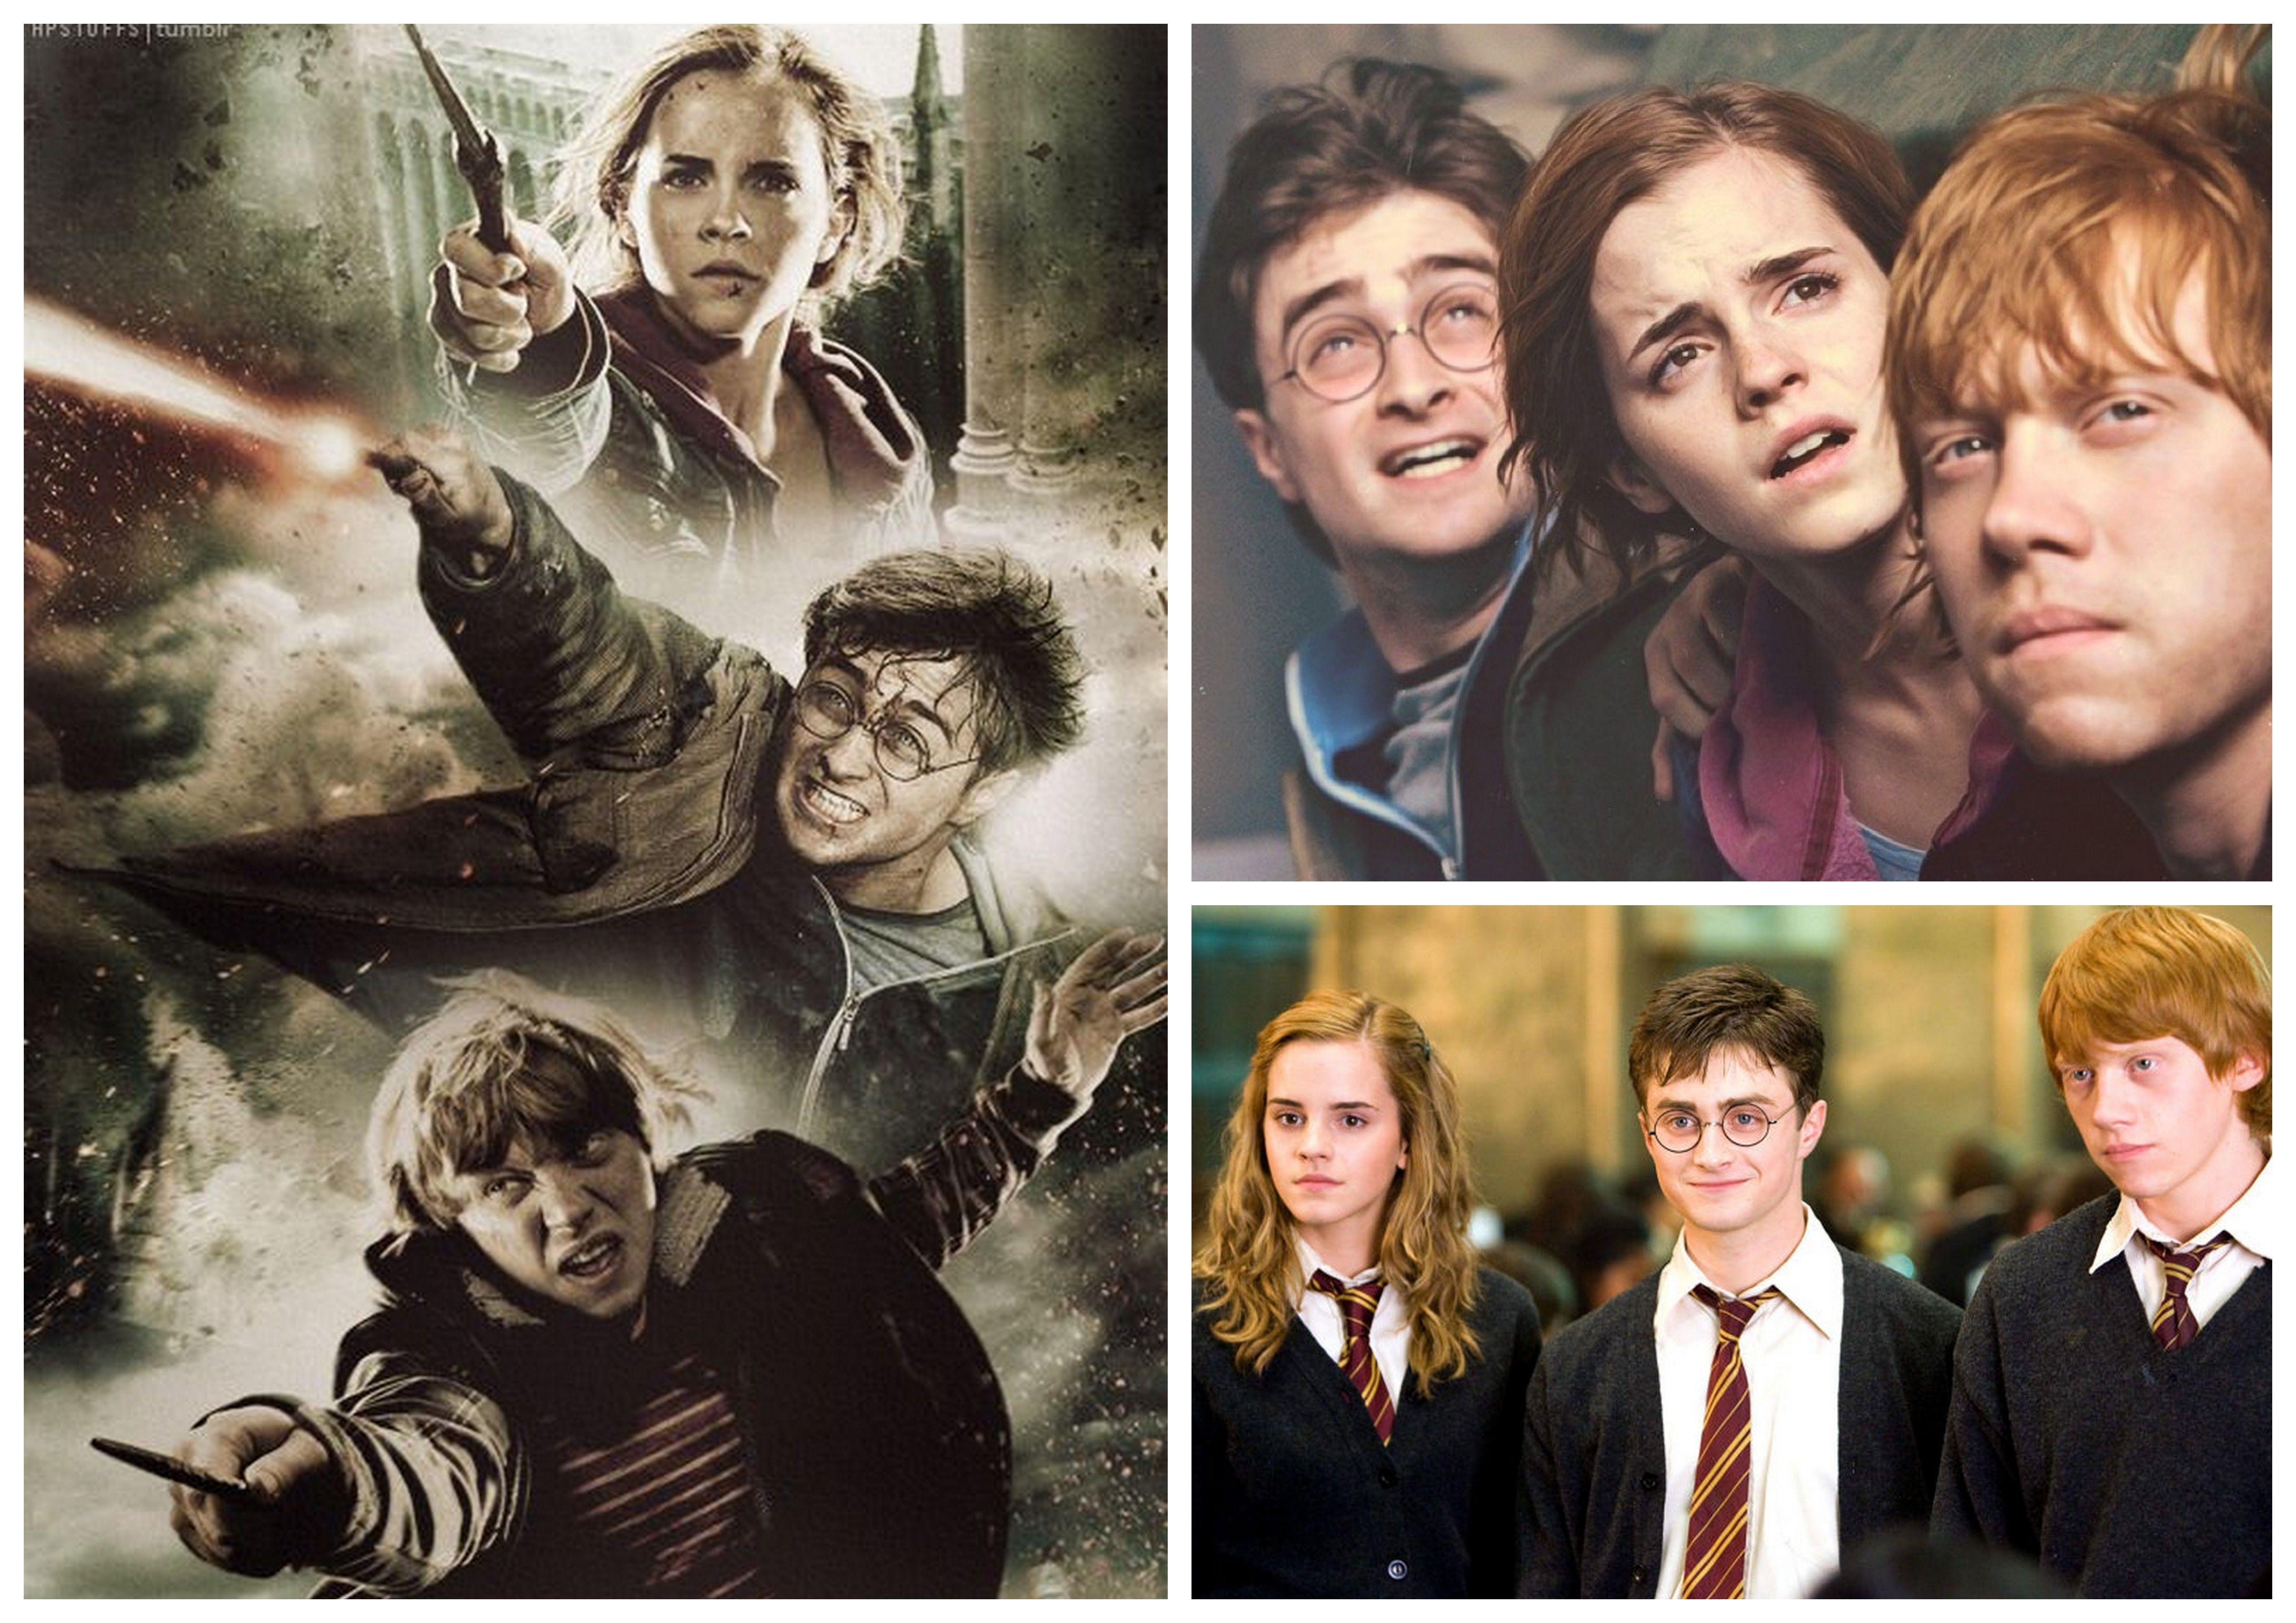 Wonderful Wallpaper Harry Potter Collage - d09cb41d309d3b232194ad50ff6a165c  Gallery_792966.jpg